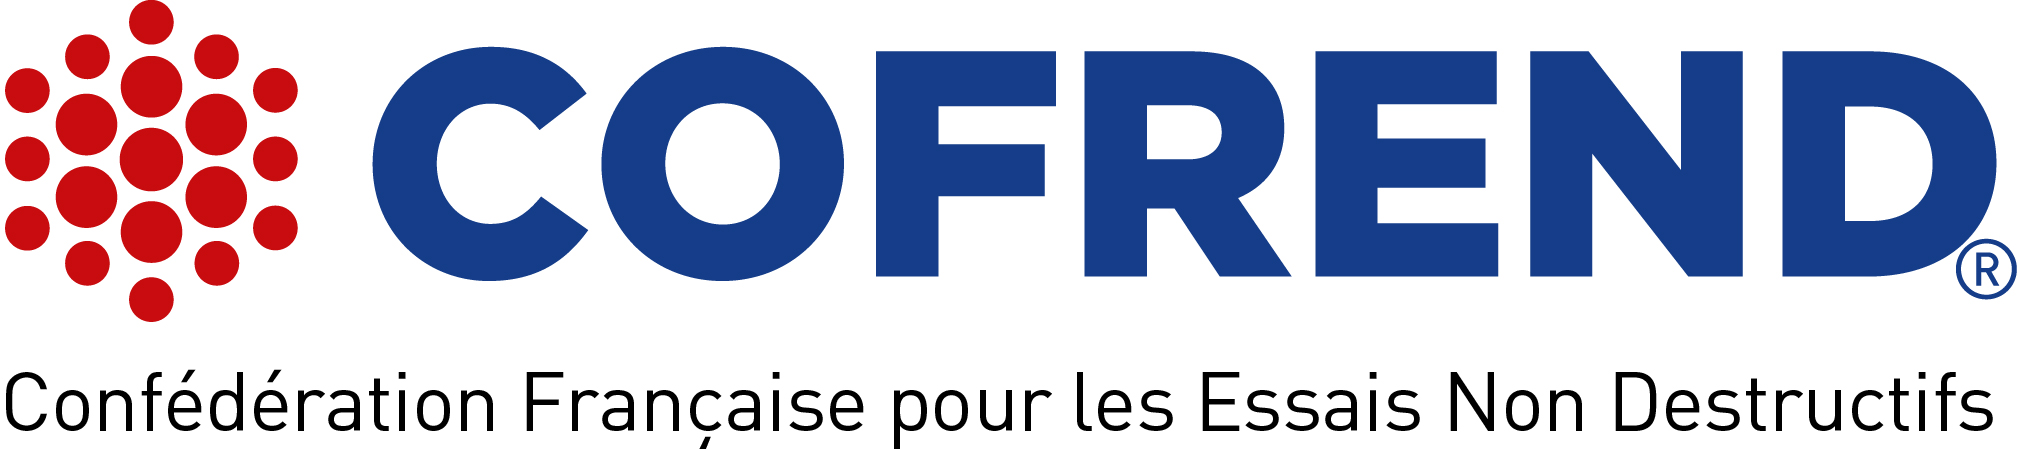 Logo Cofrend